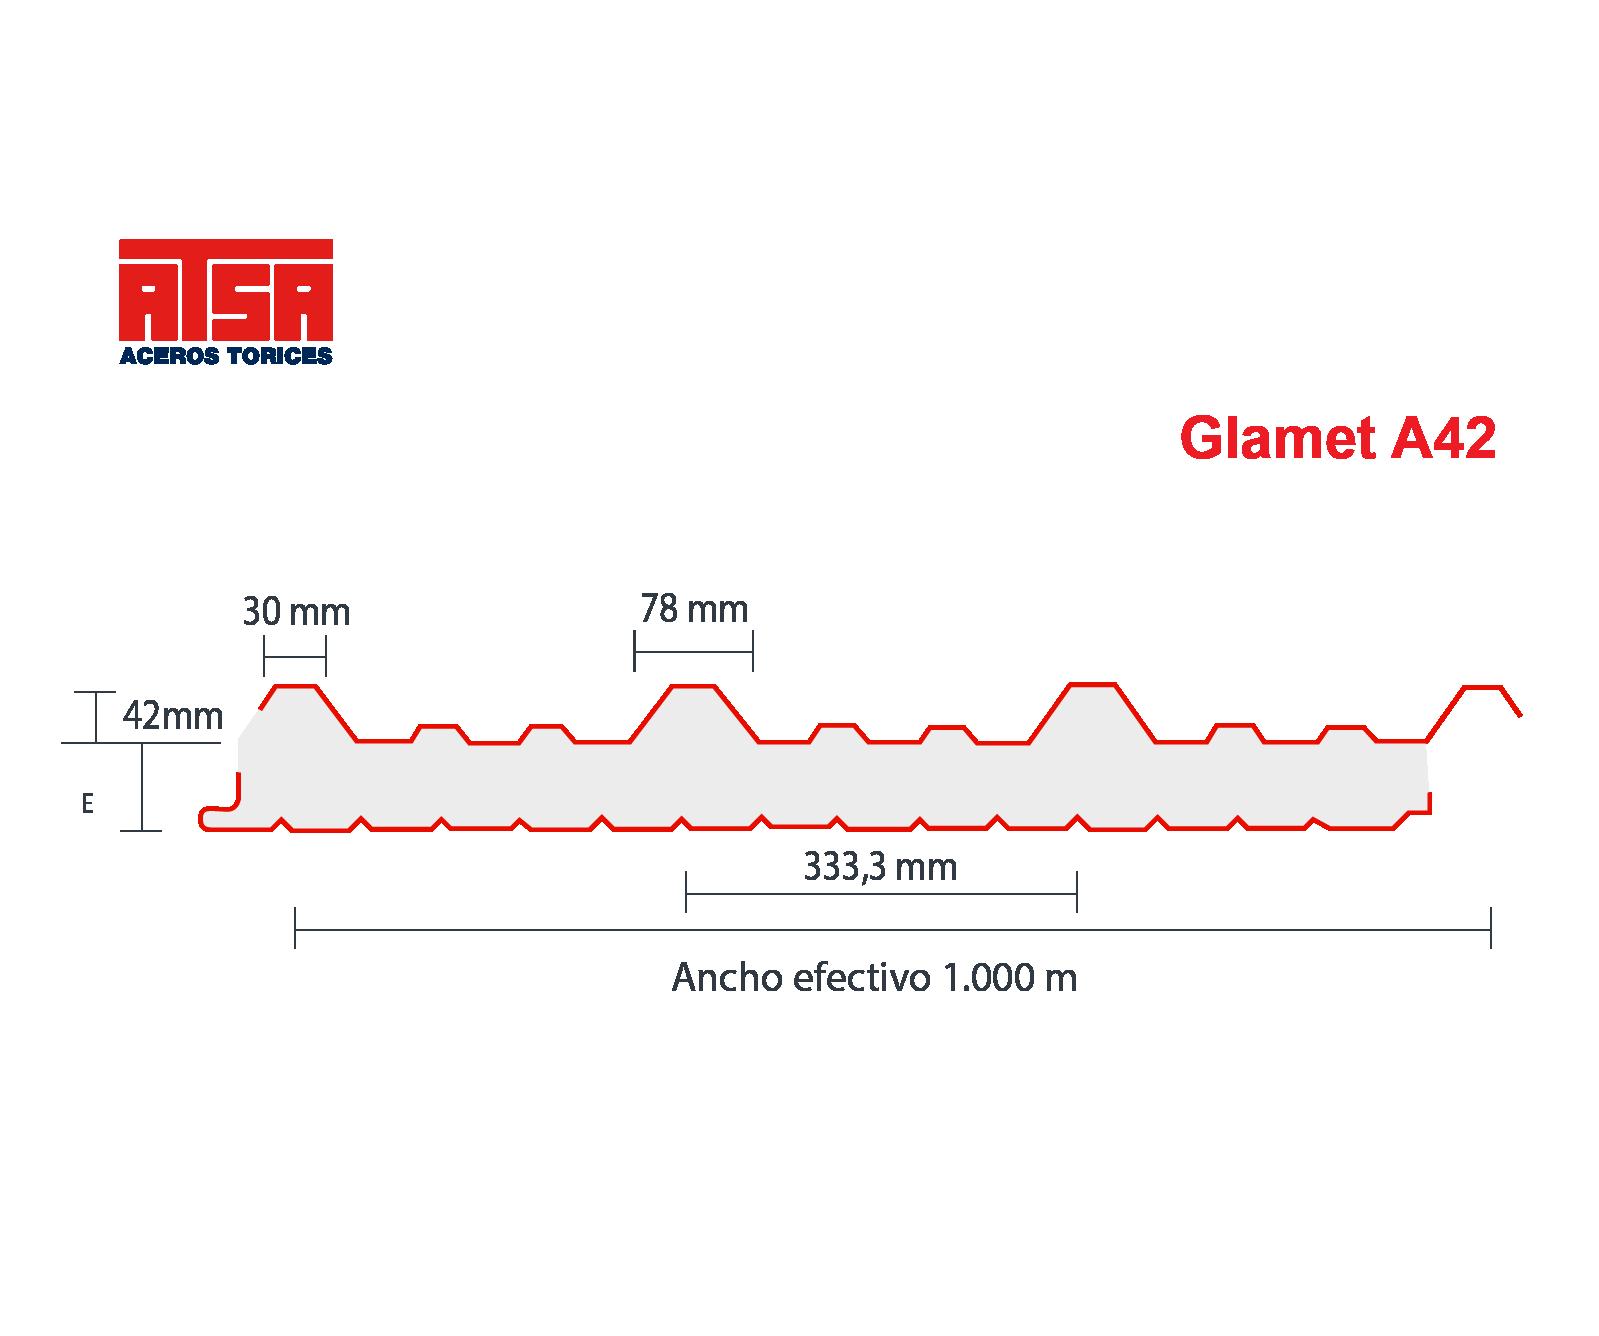 medidas-panel-glamet-a42-atsa